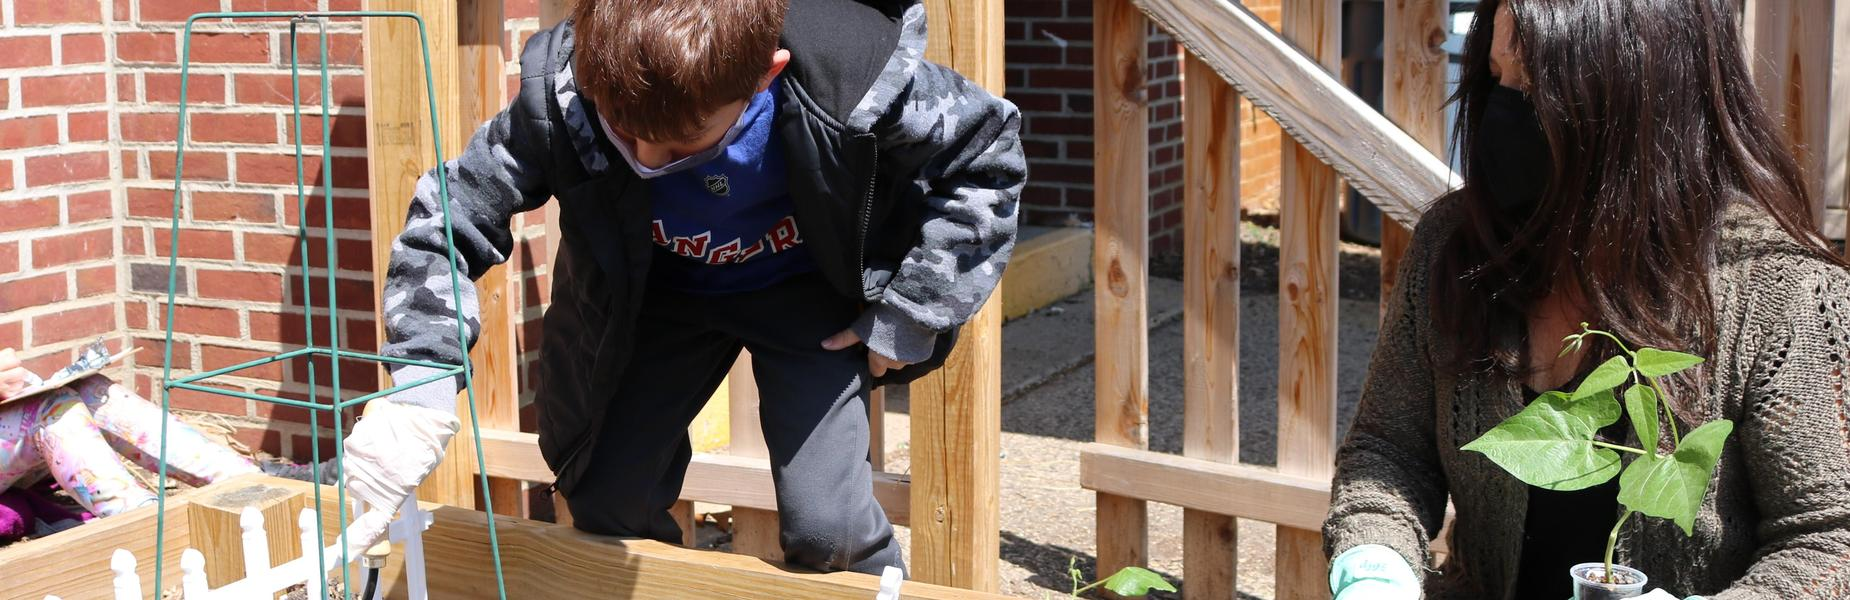 Photo of 1st grader and teacher tranplanting seeding in school garden.